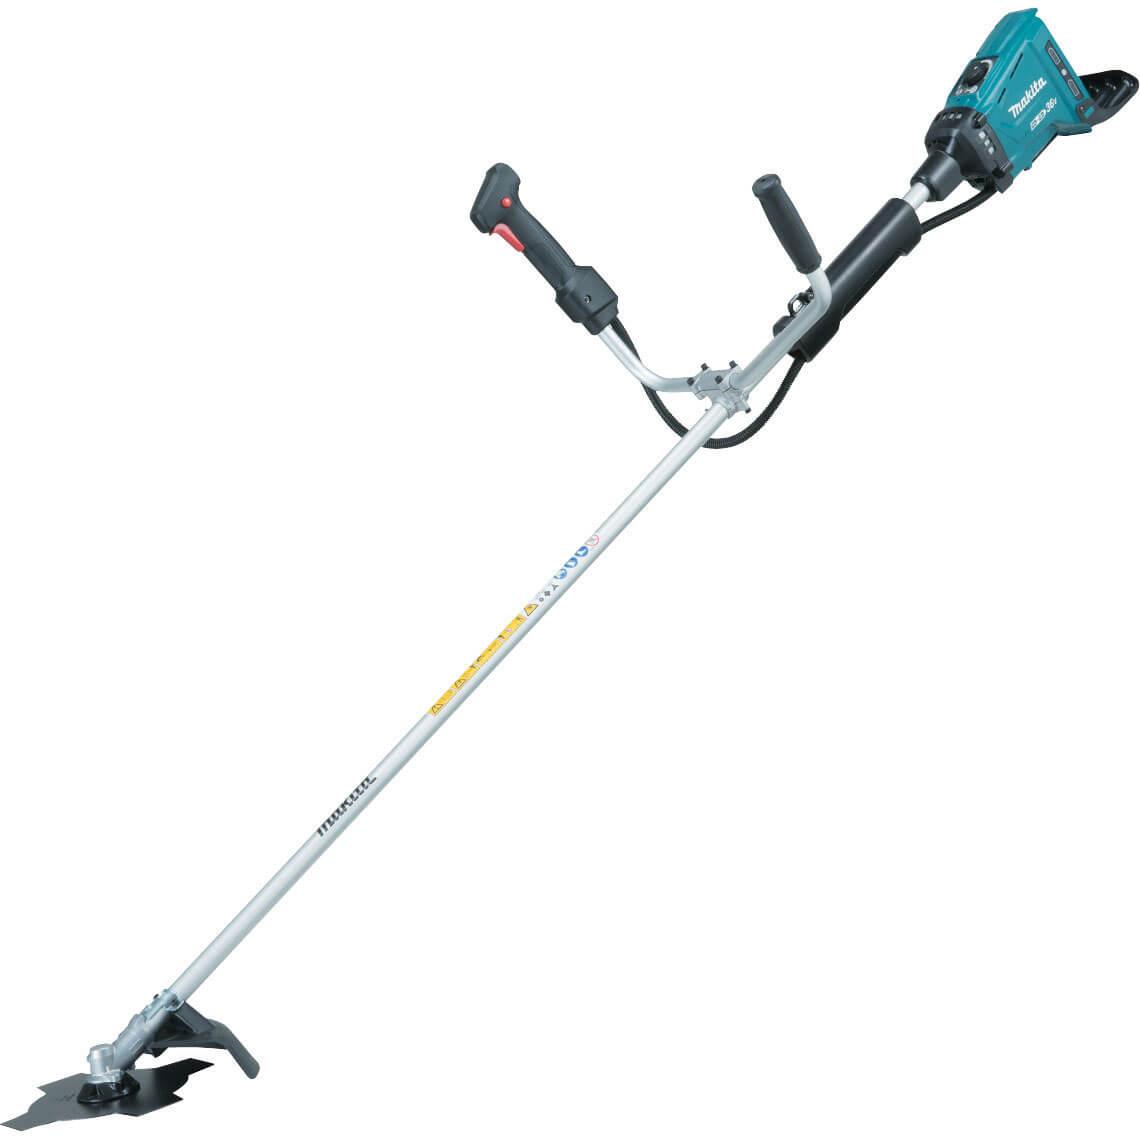 Makita DUR361U 36v Cordless LXT Brush Cutter